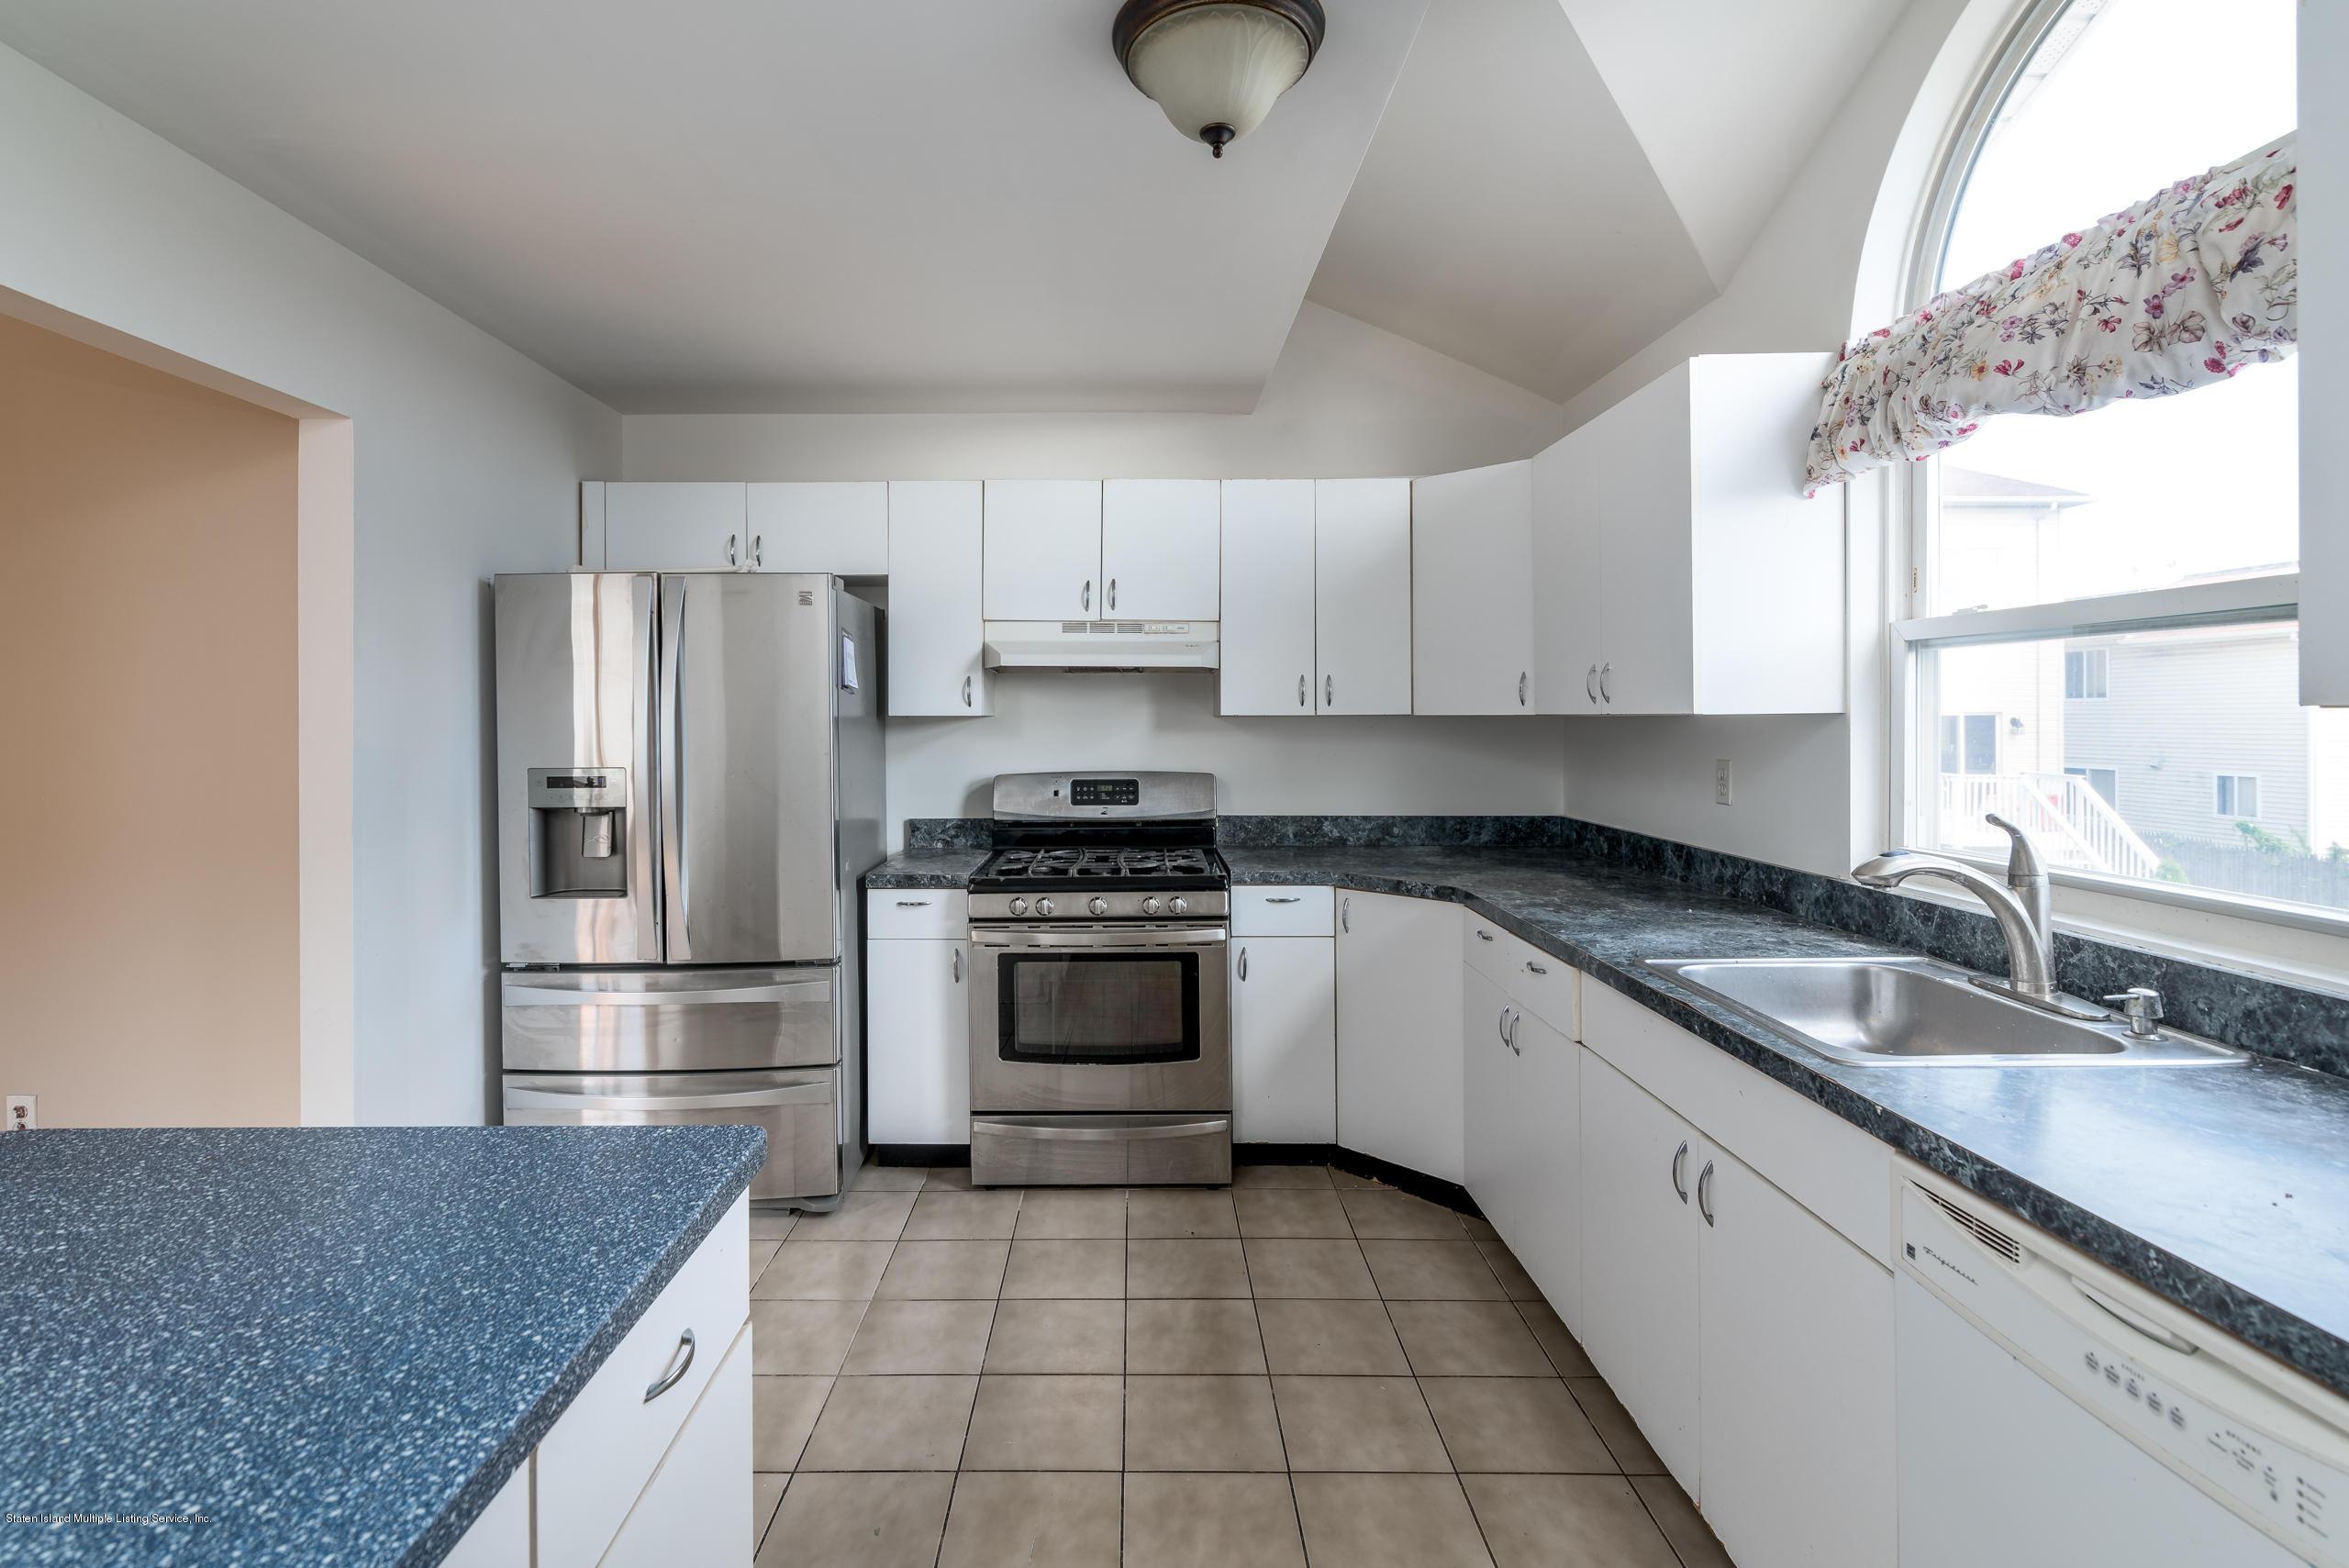 Single Family - Semi-Attached 230 Holden Boulevard  Staten Island, NY 10314, MLS-1130208-4